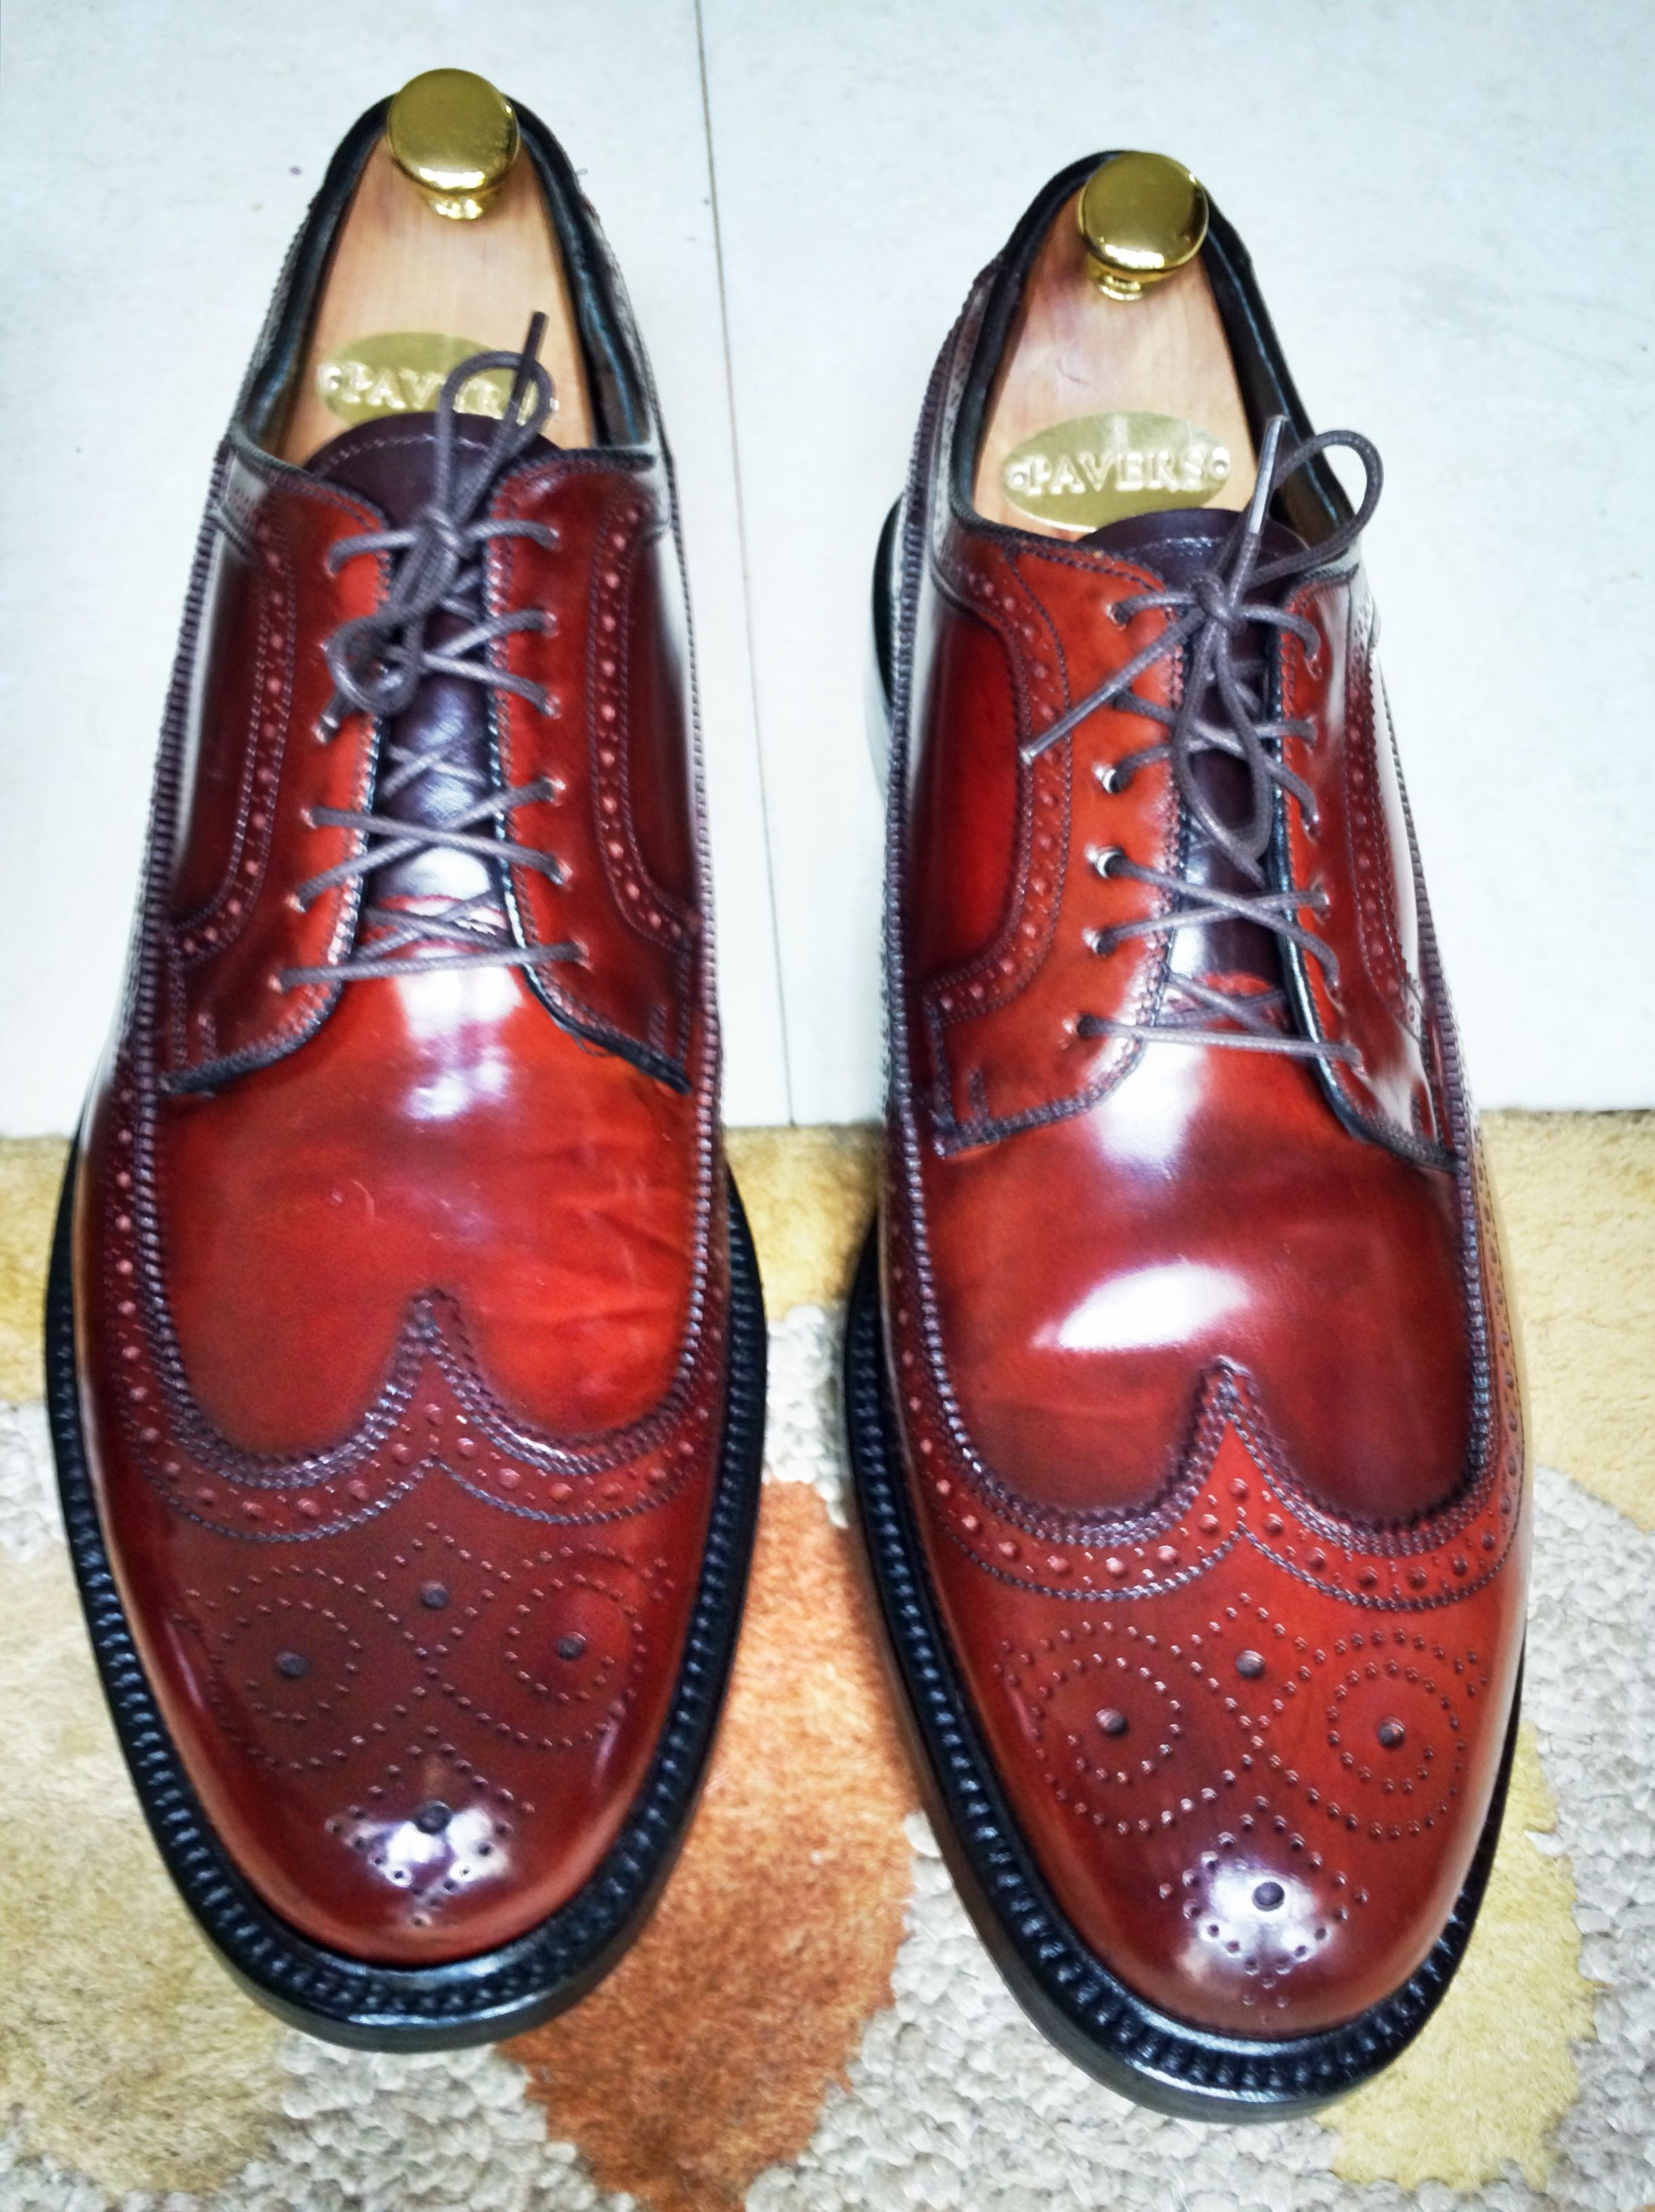 vijayagopalp's photos in Vintage Dress shoe appreciation, tips, maintenance and advice